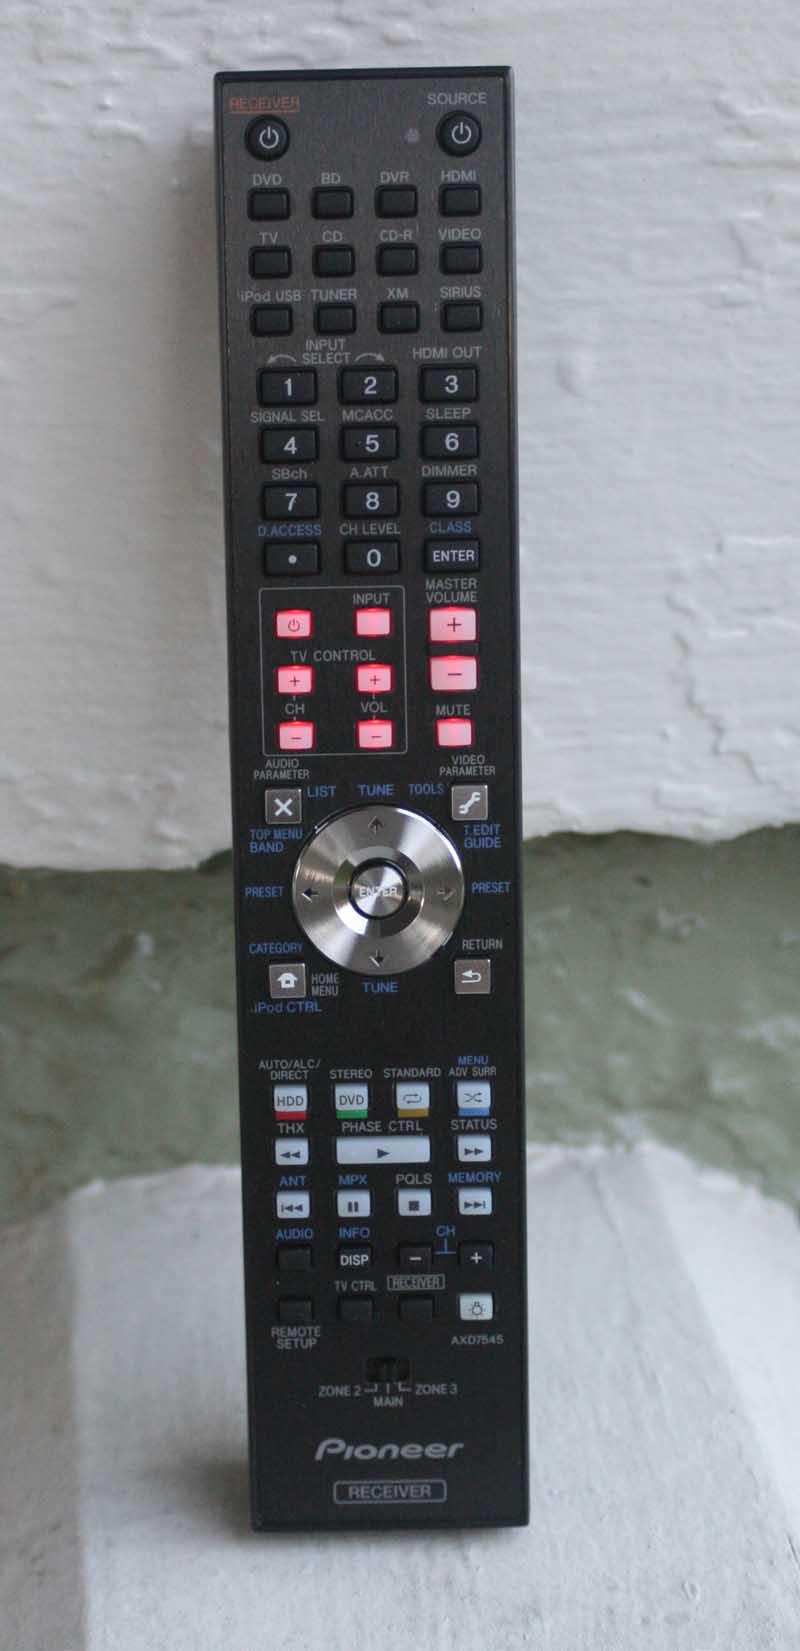 RemoteControlFullScreenImageAudioholics